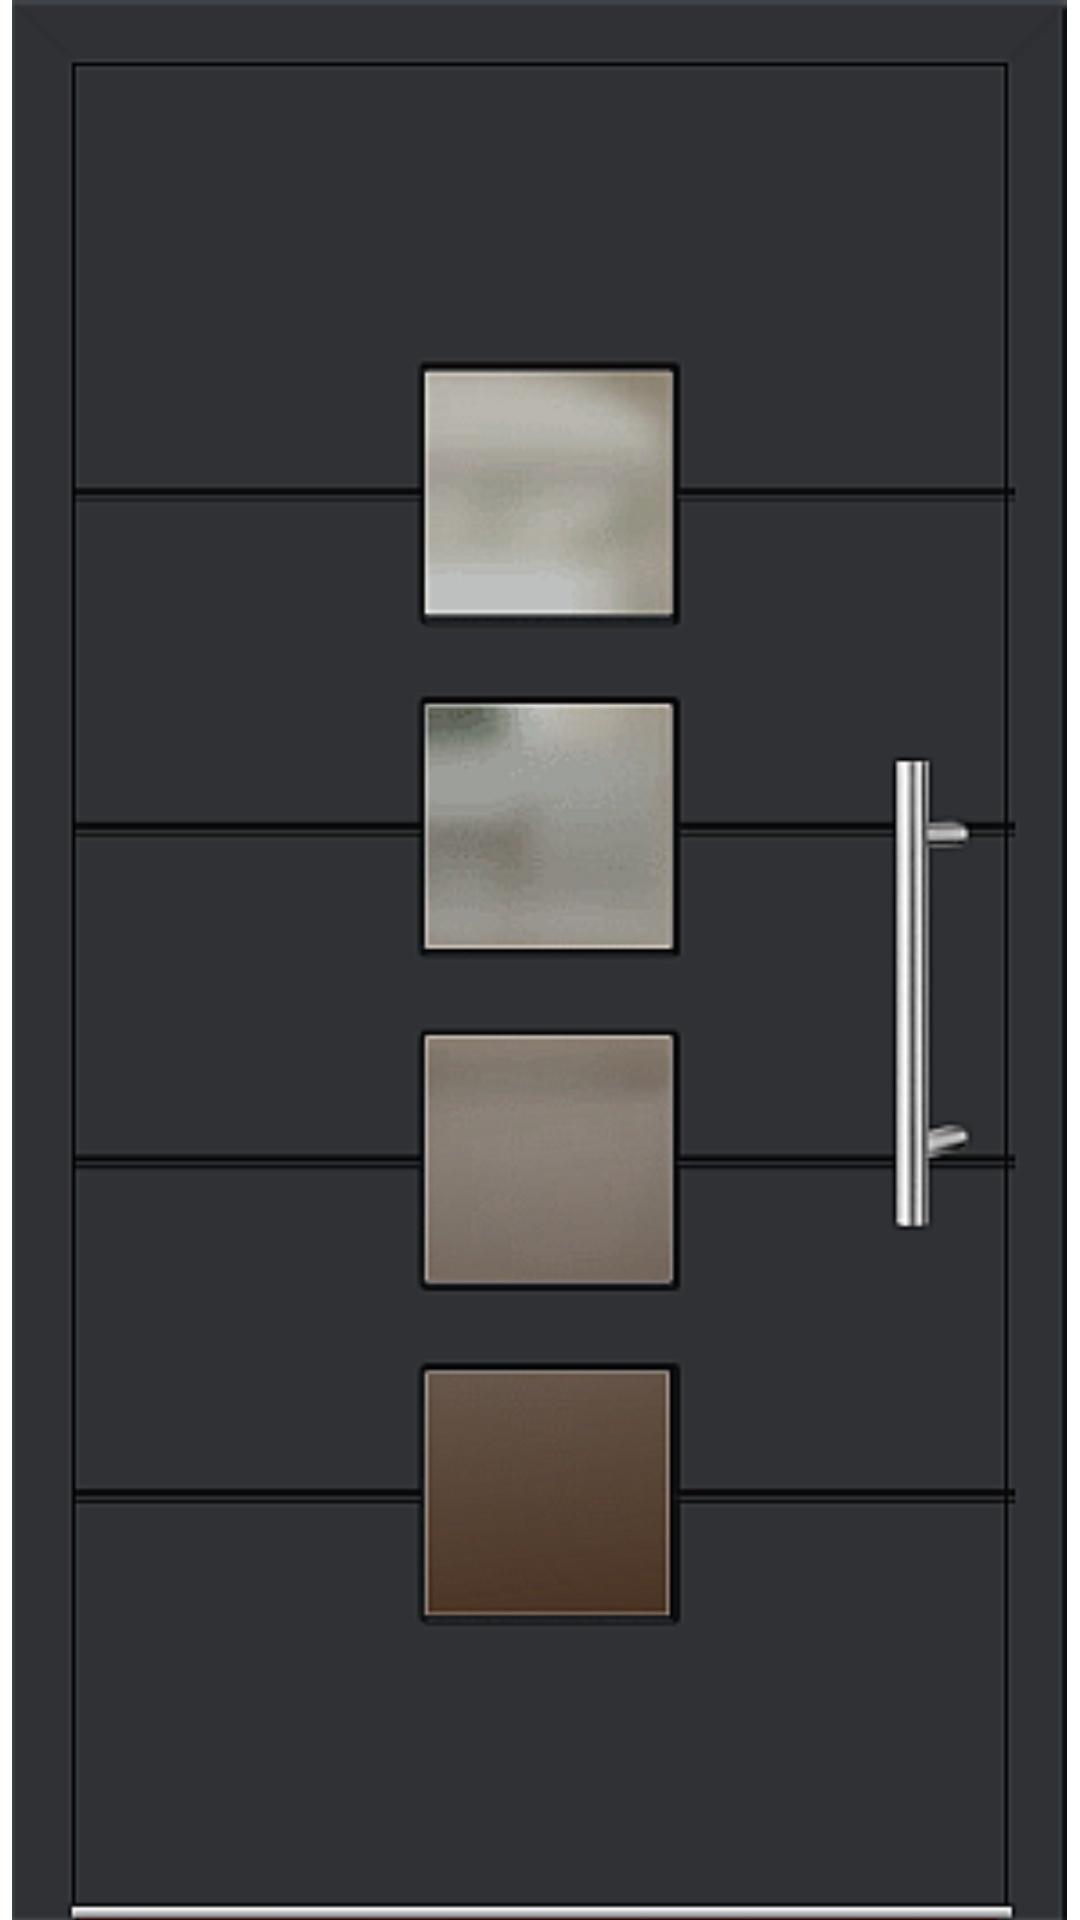 Aluminium Haustür Modell 6821-52 schwarz